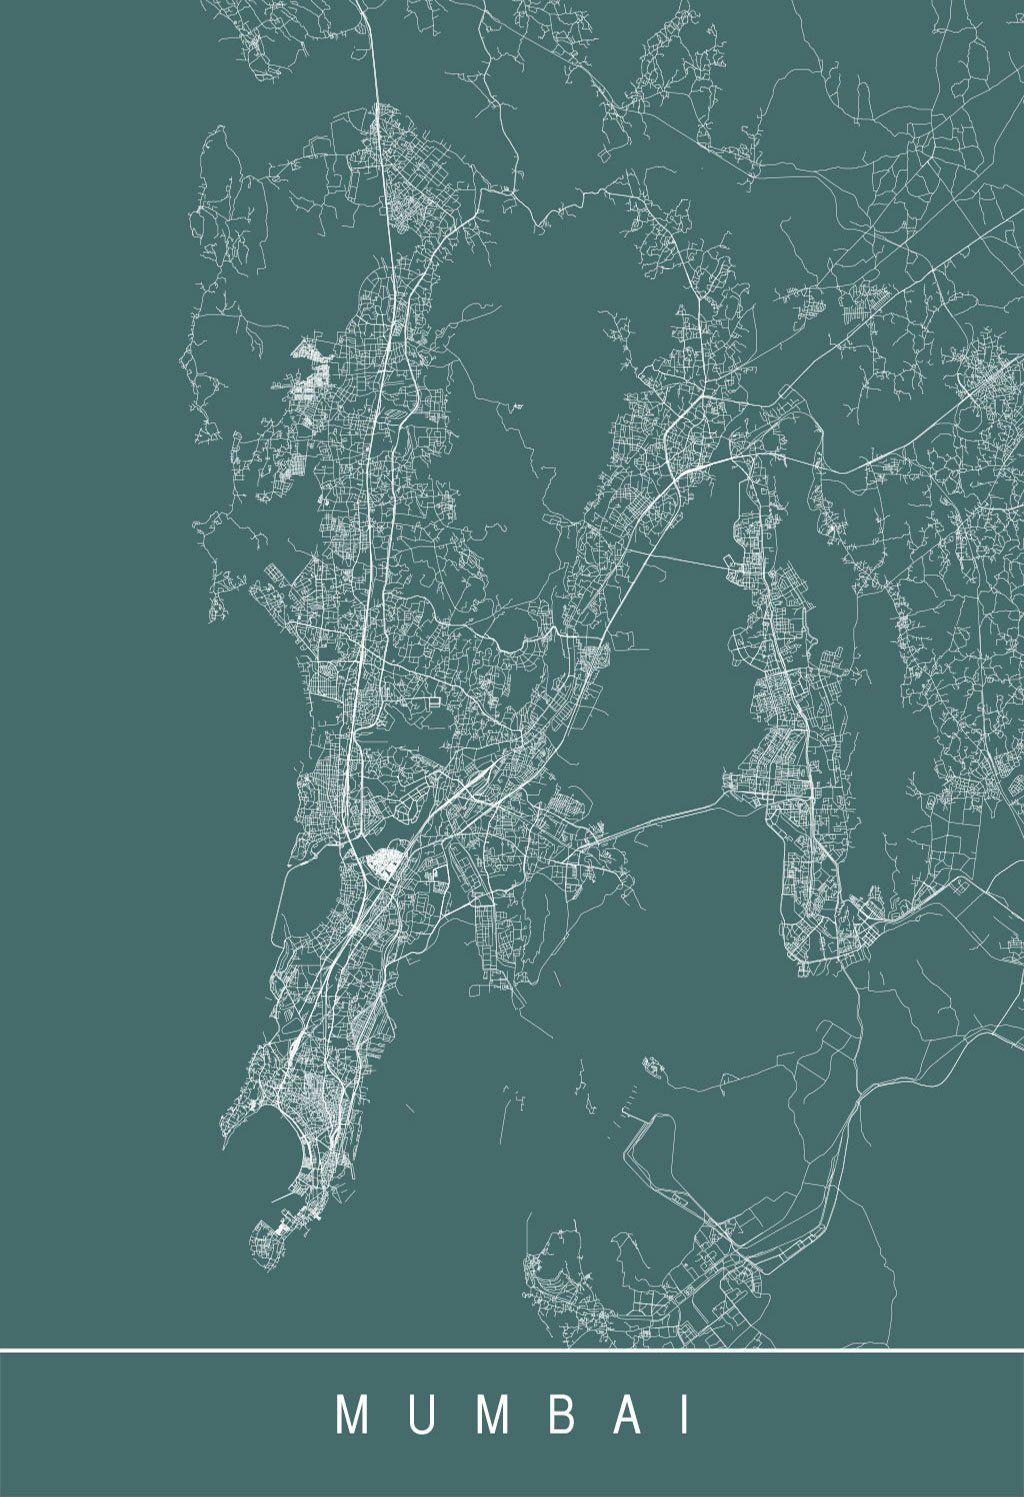 Mumbai Map Poster Modern City Print Art Customizable Etsy